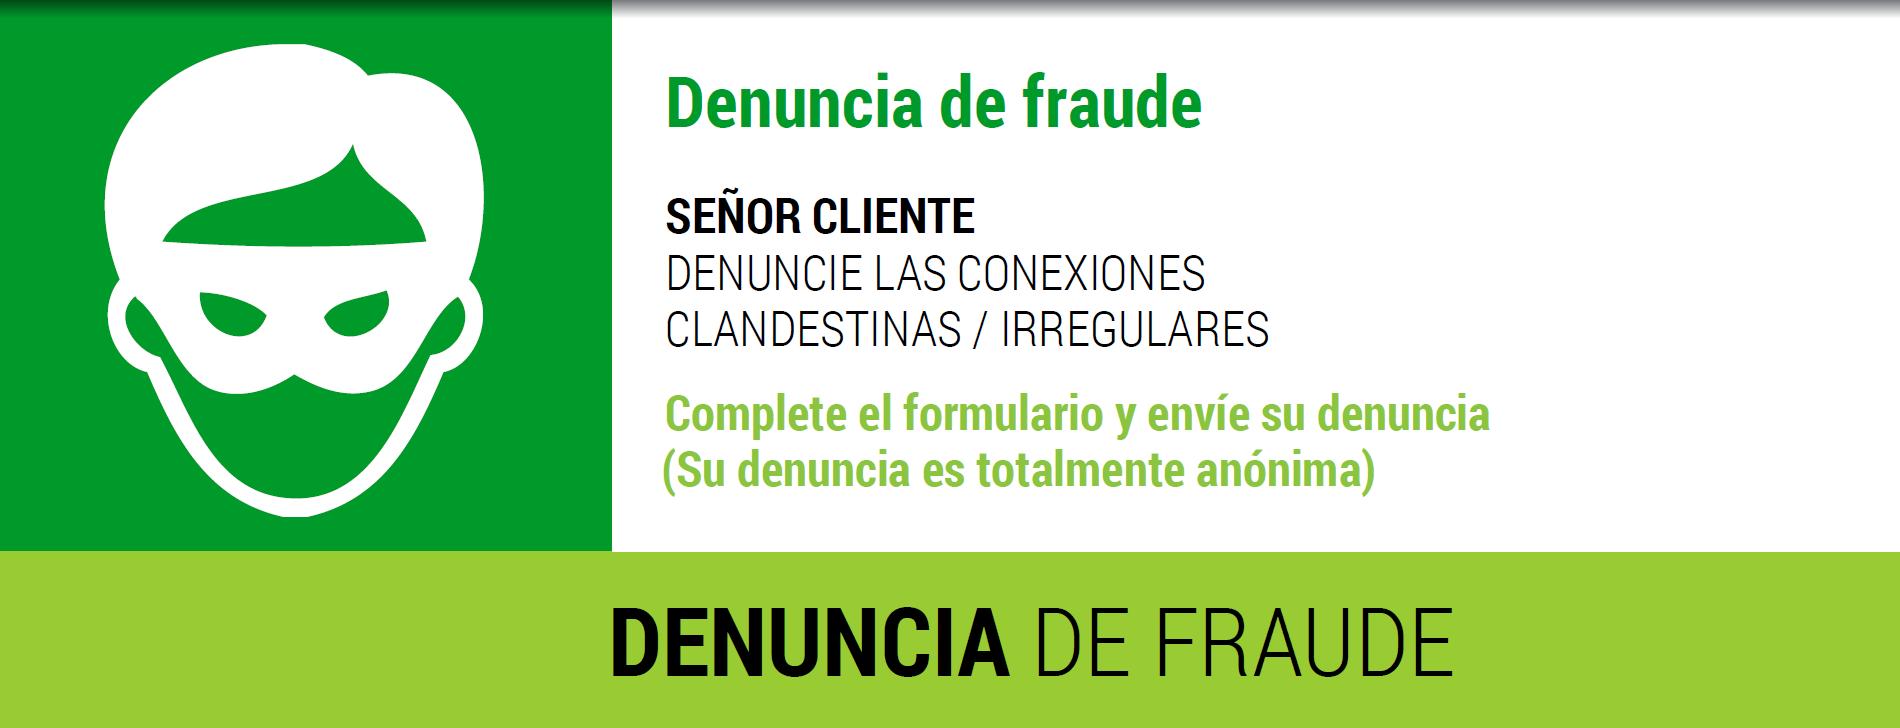 denuncia-de-fraude-slider